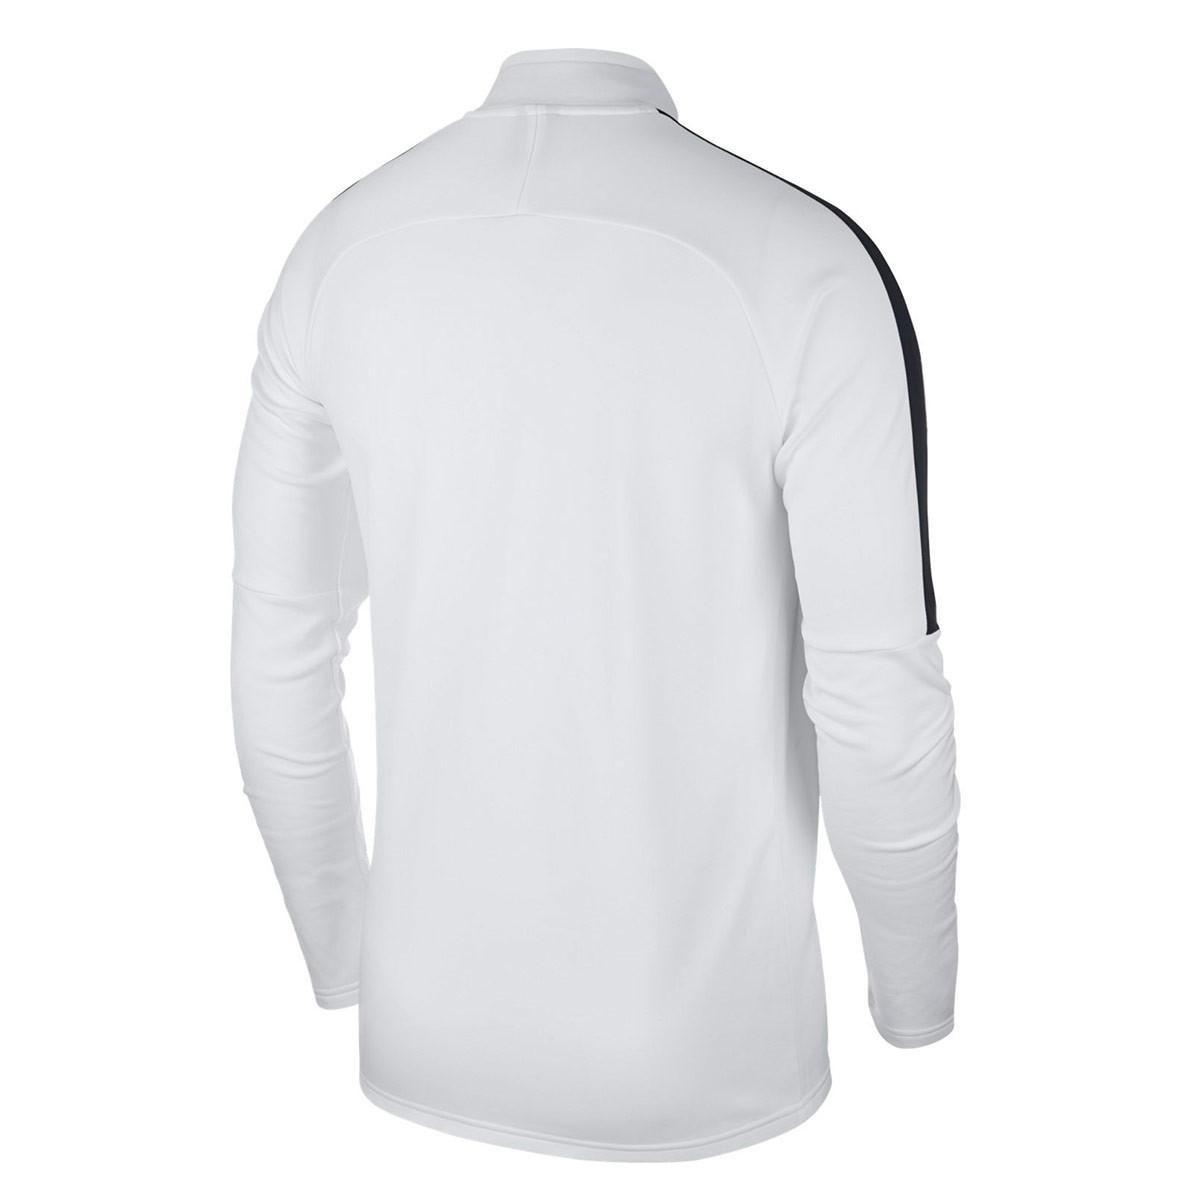 3bf2f347238 Sweatshirt Nike Kids Academy 18 Drill White-Black-Black - Football store  Fútbol Emotion